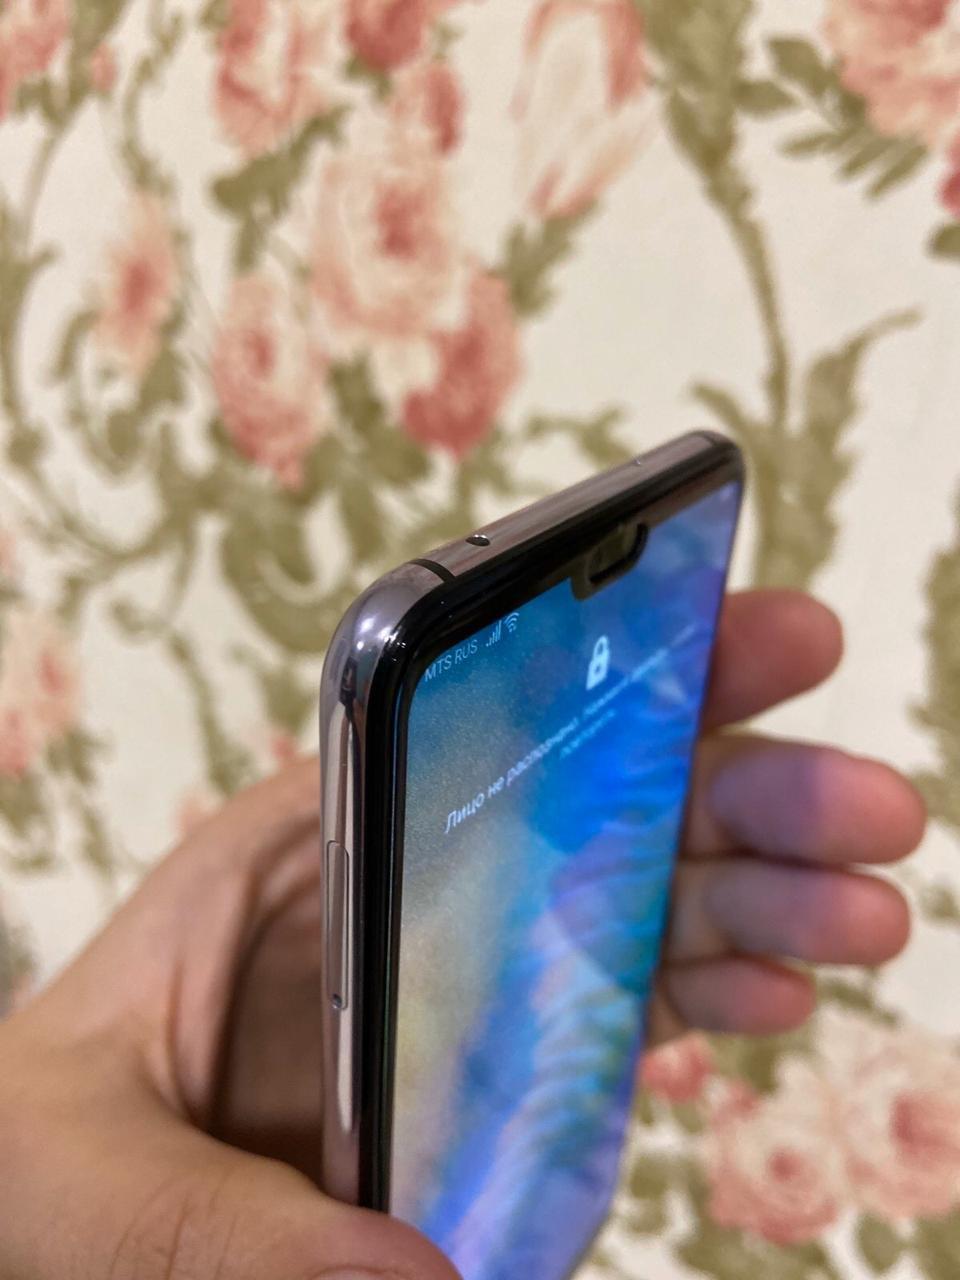 Купить Huawei P20 Pro 6/128 ‼️Возможен обмен на | Объявления Орска и Новотроицка №935